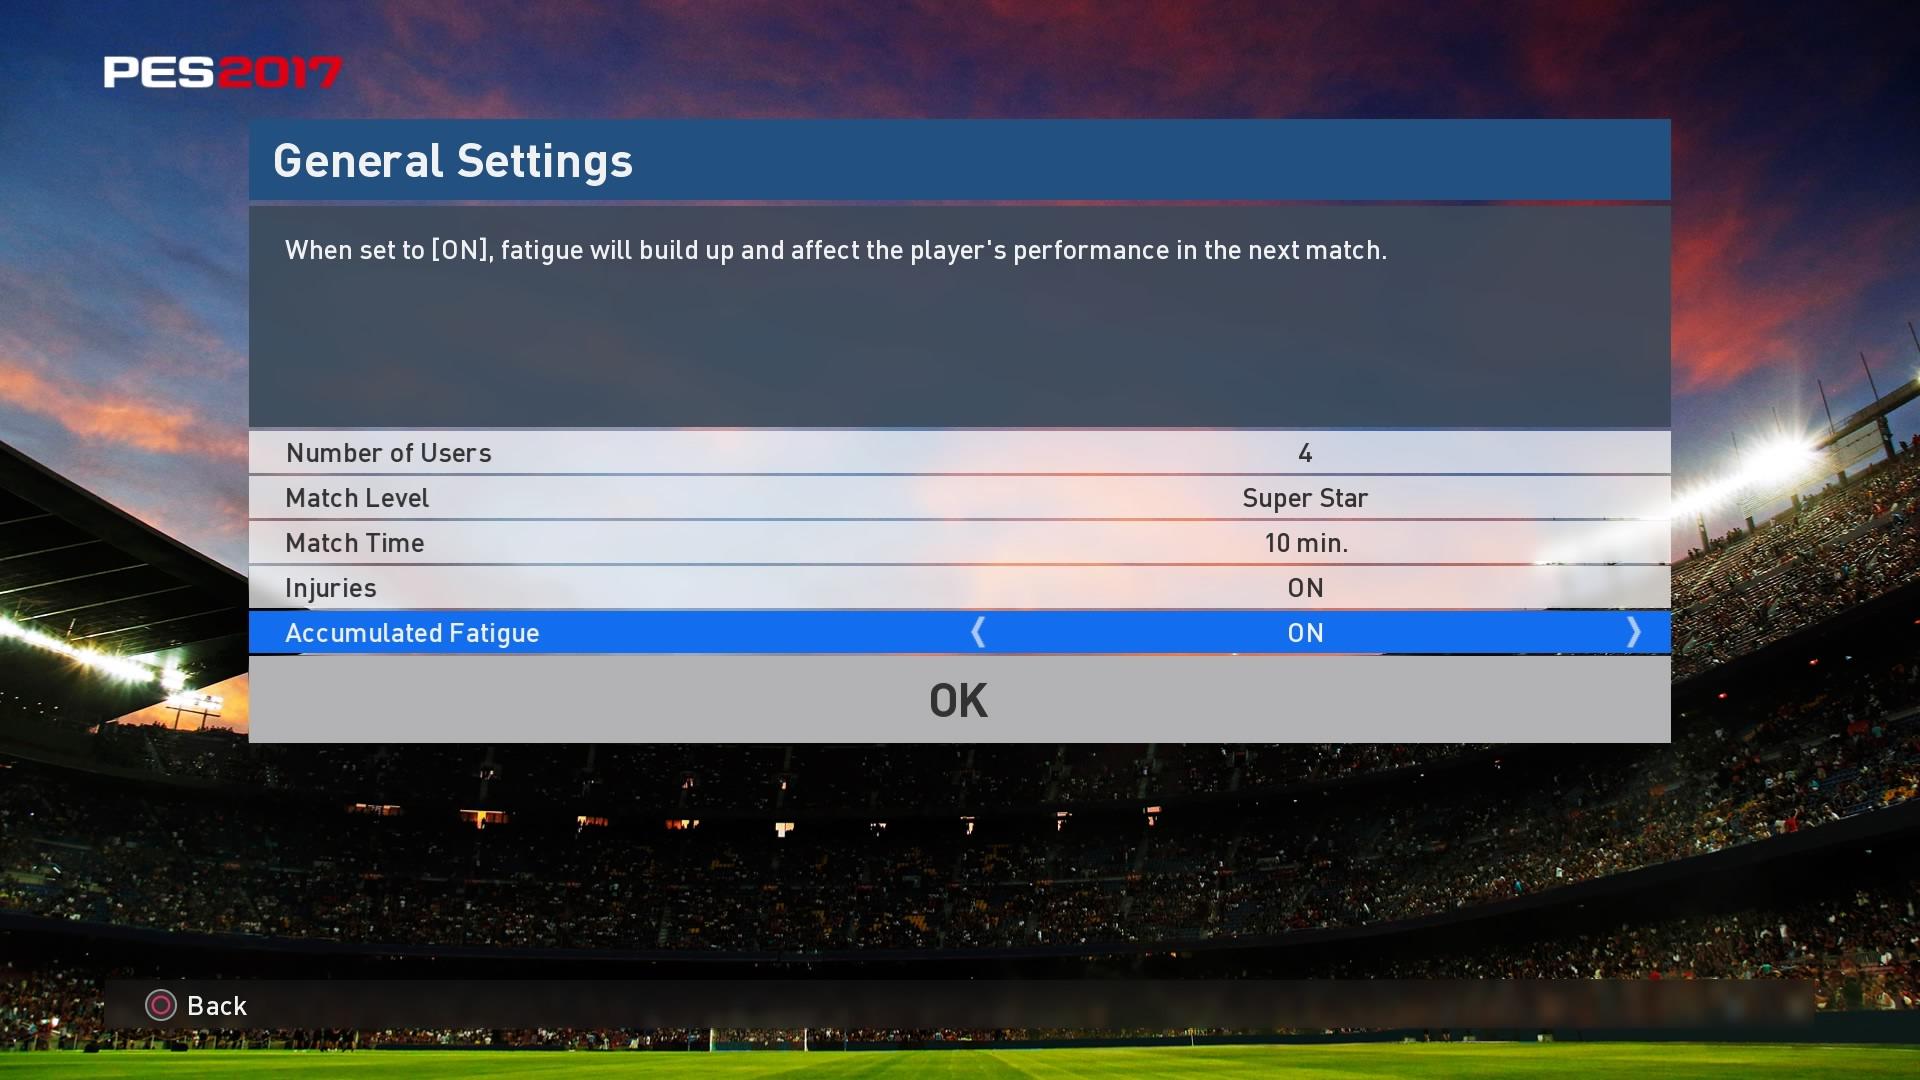 Custom League PES 2017 - Options 2